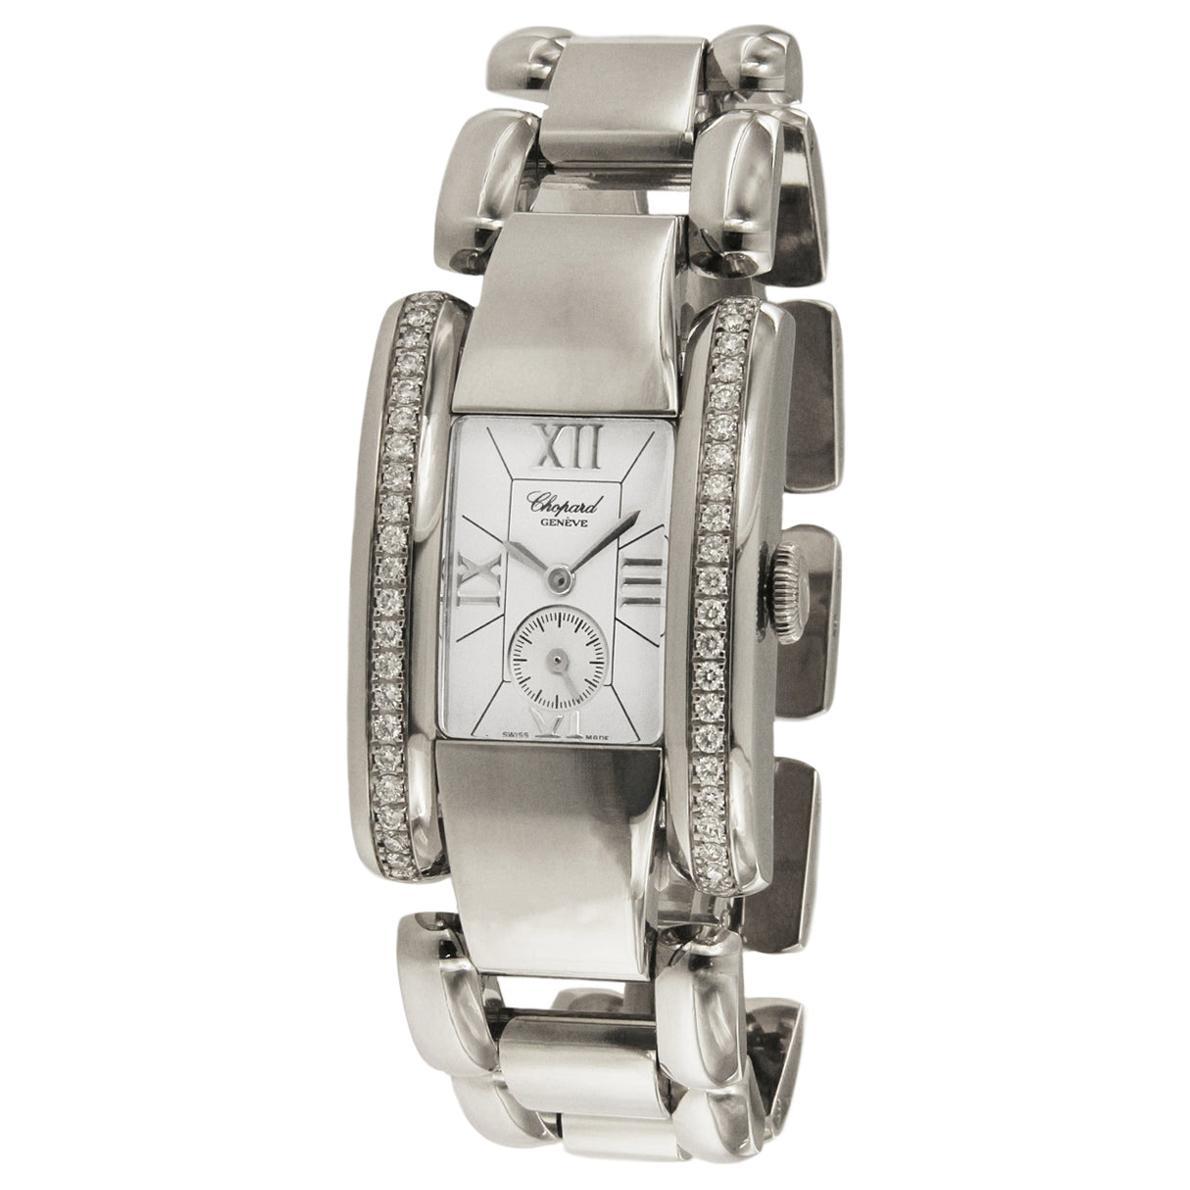 Chopard Lastrada Diamond Stainless Steel Watch 418415